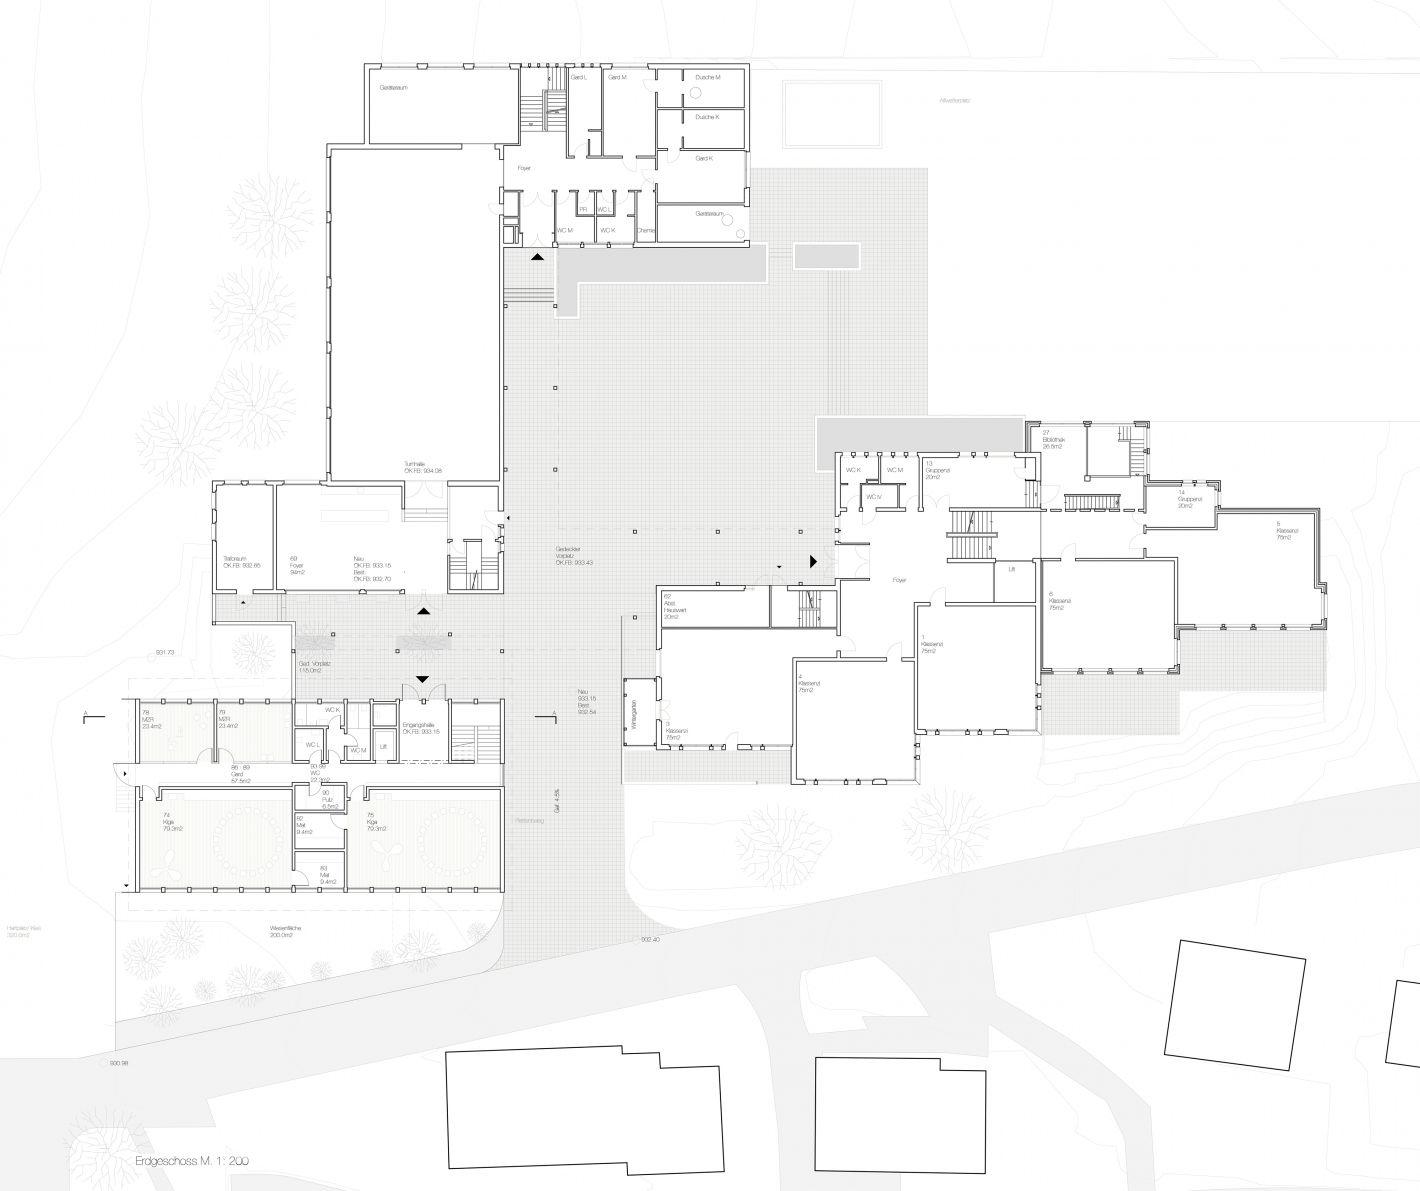 Grundriss Erdgeschoss mit Bestandsgebäuden